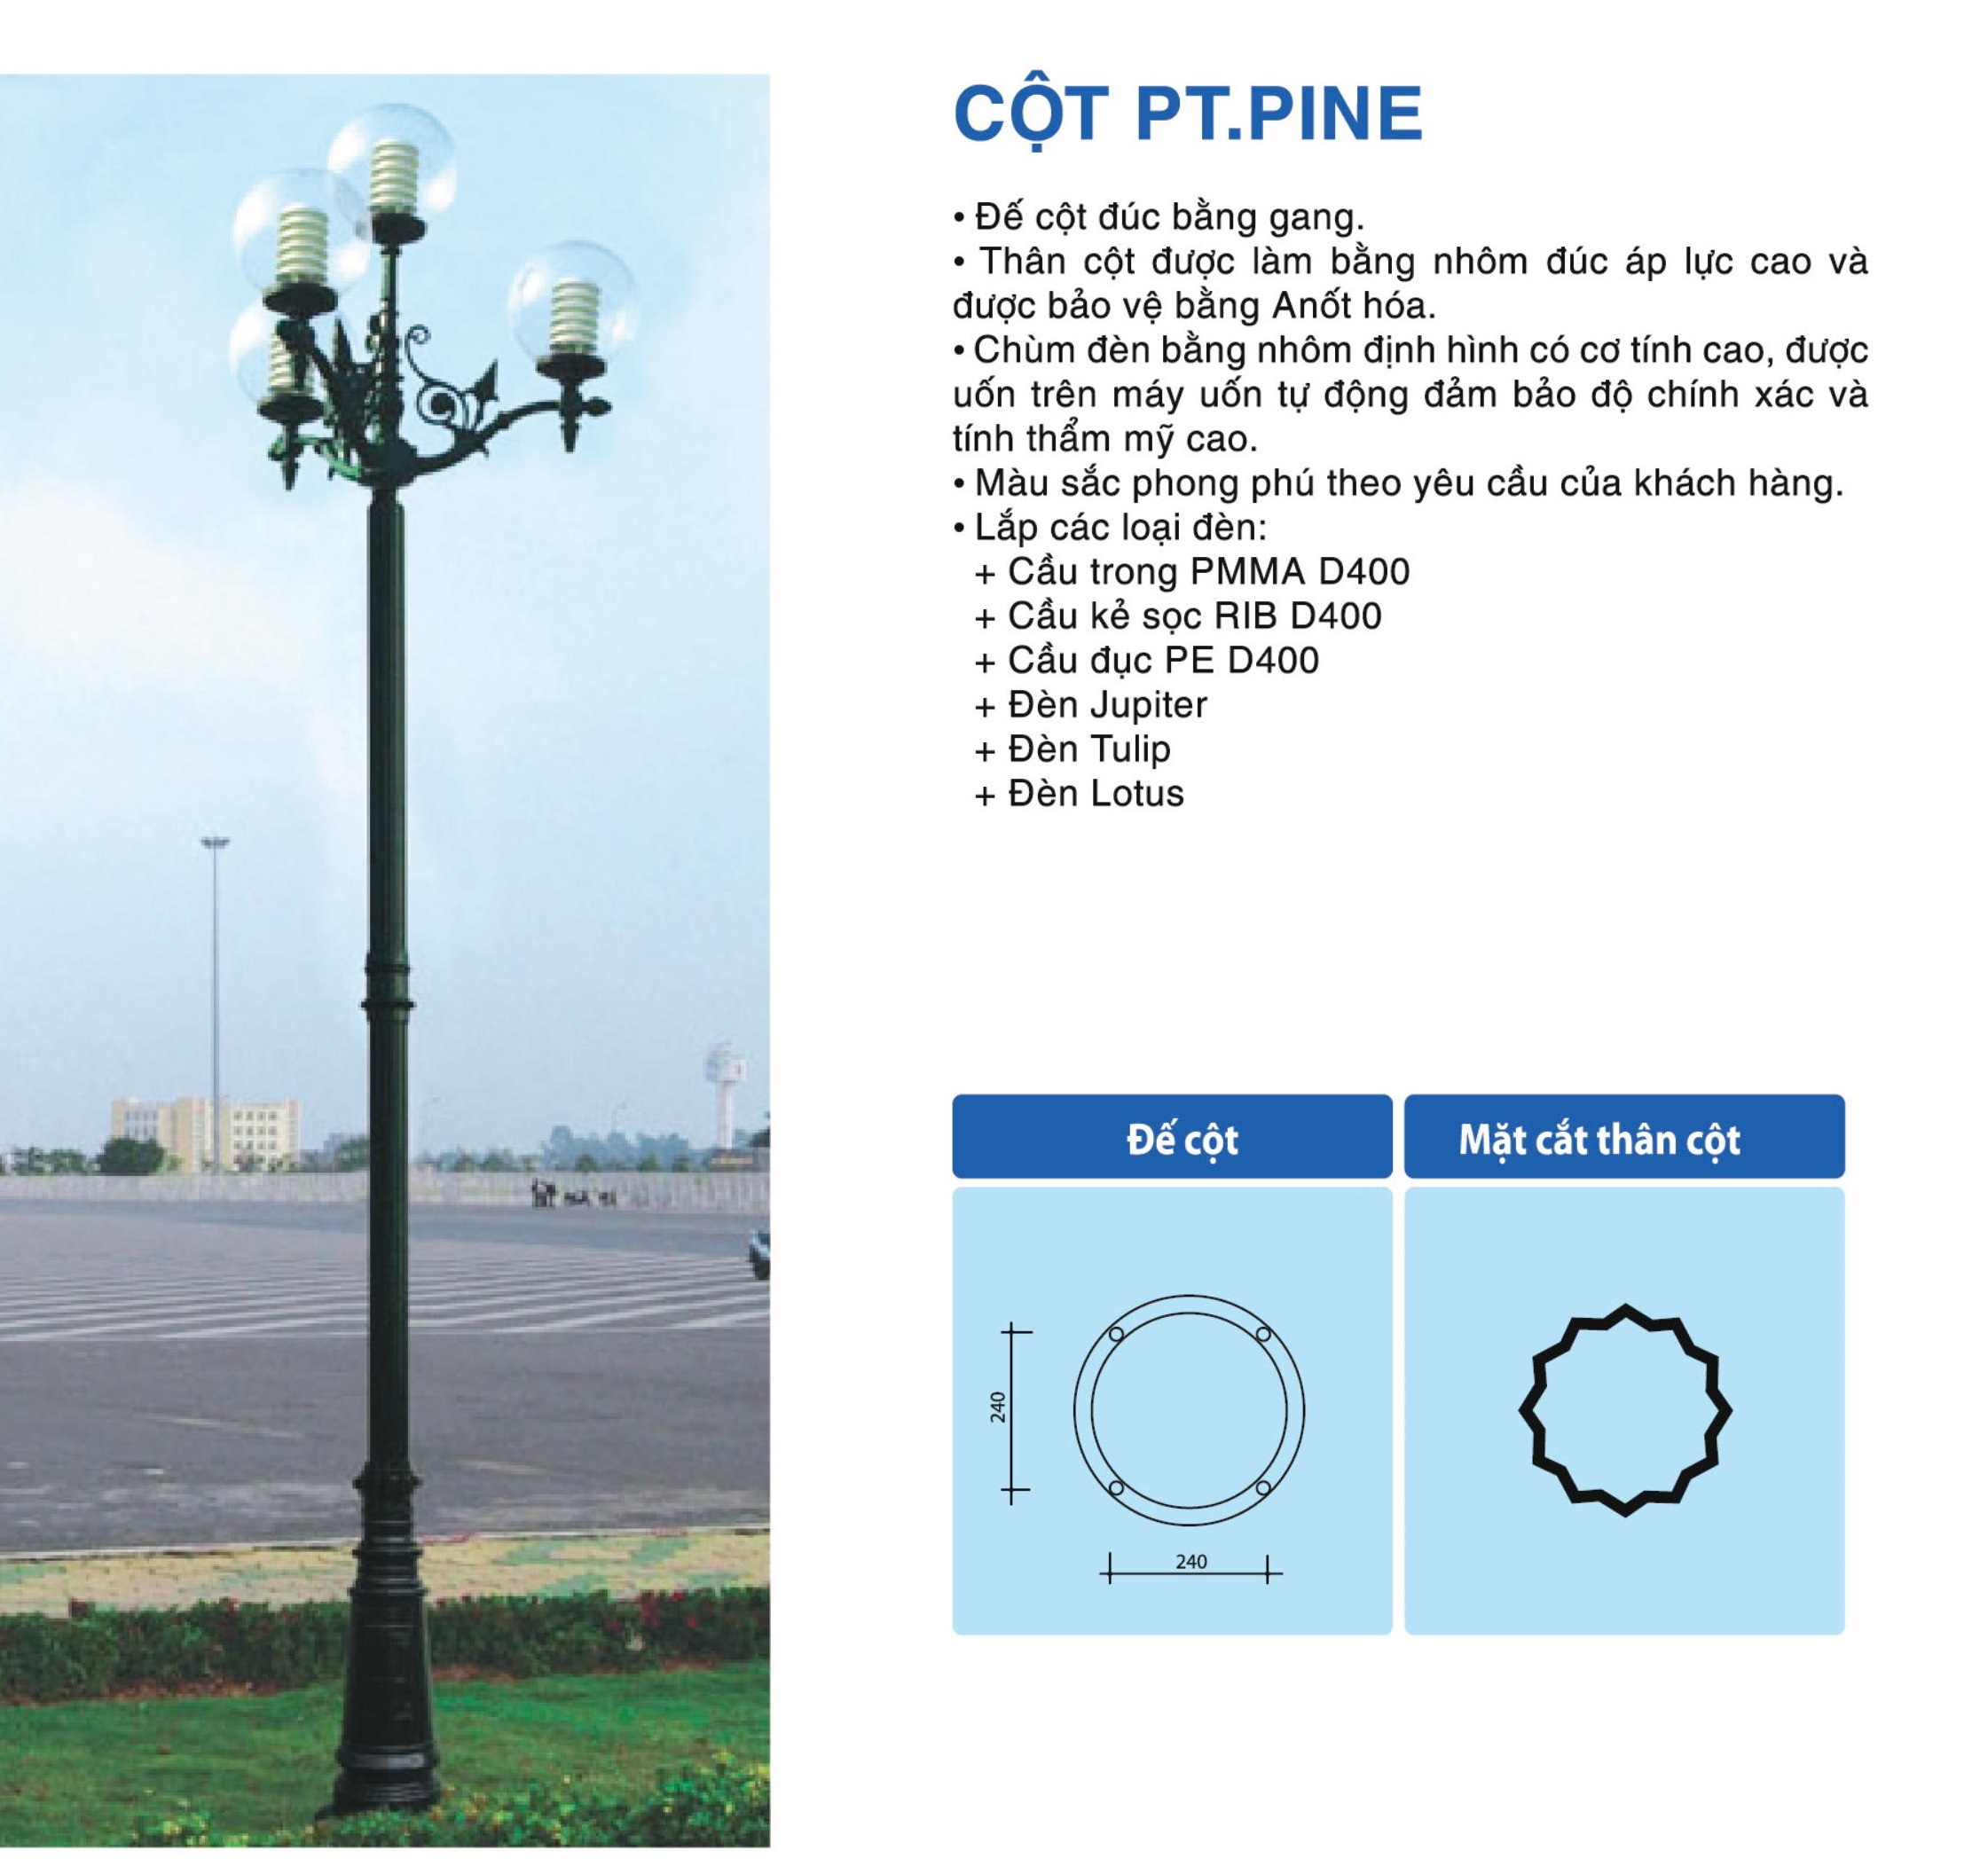 cot-pt-pine